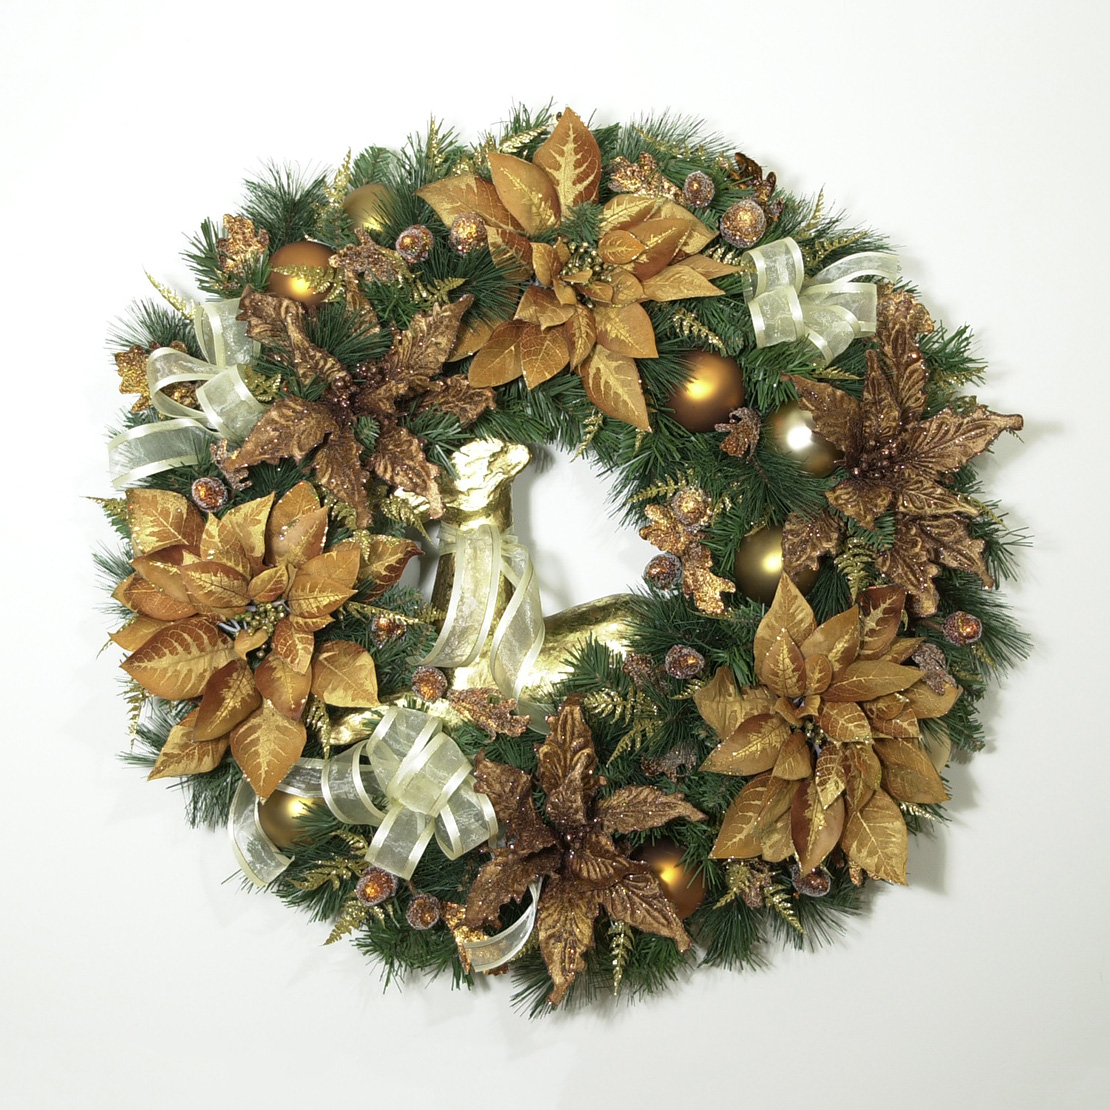 Americana christmas ornaments - Americana Christmas Wreath